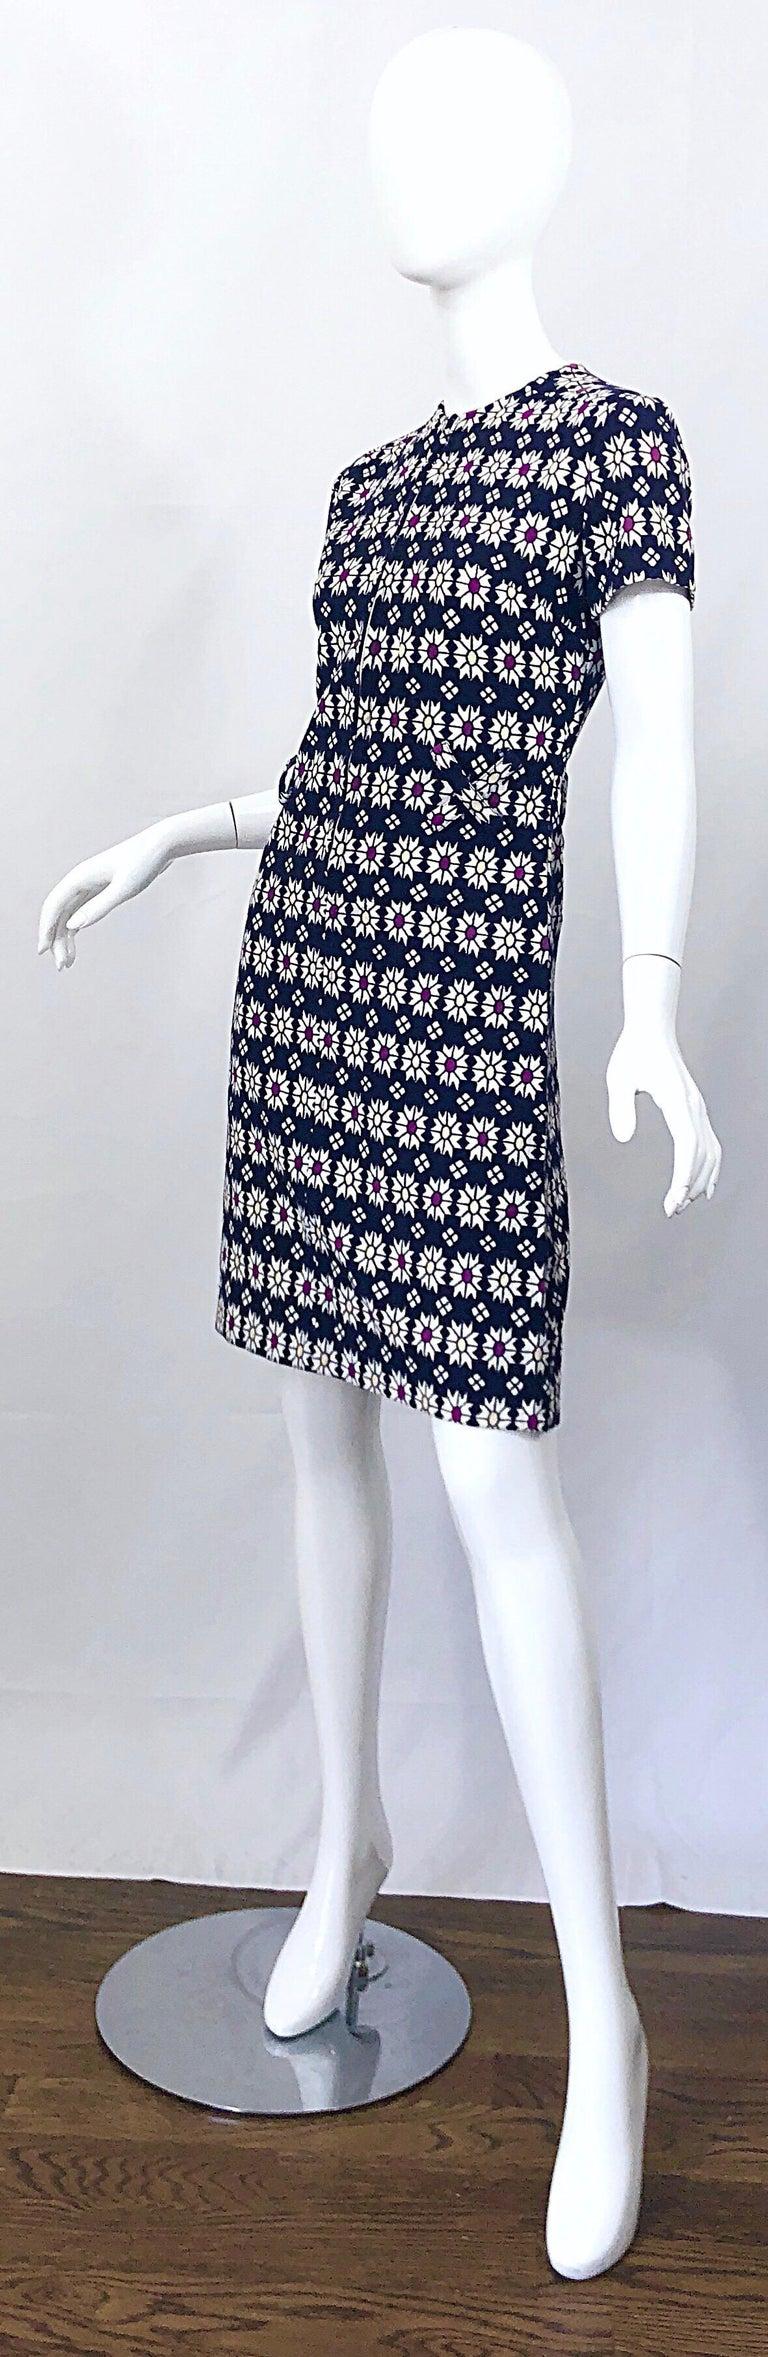 Chic 1960s Navy Blue + Fuchsia + Yellow Geometric Daisy Print 60s A Line Dress For Sale 2